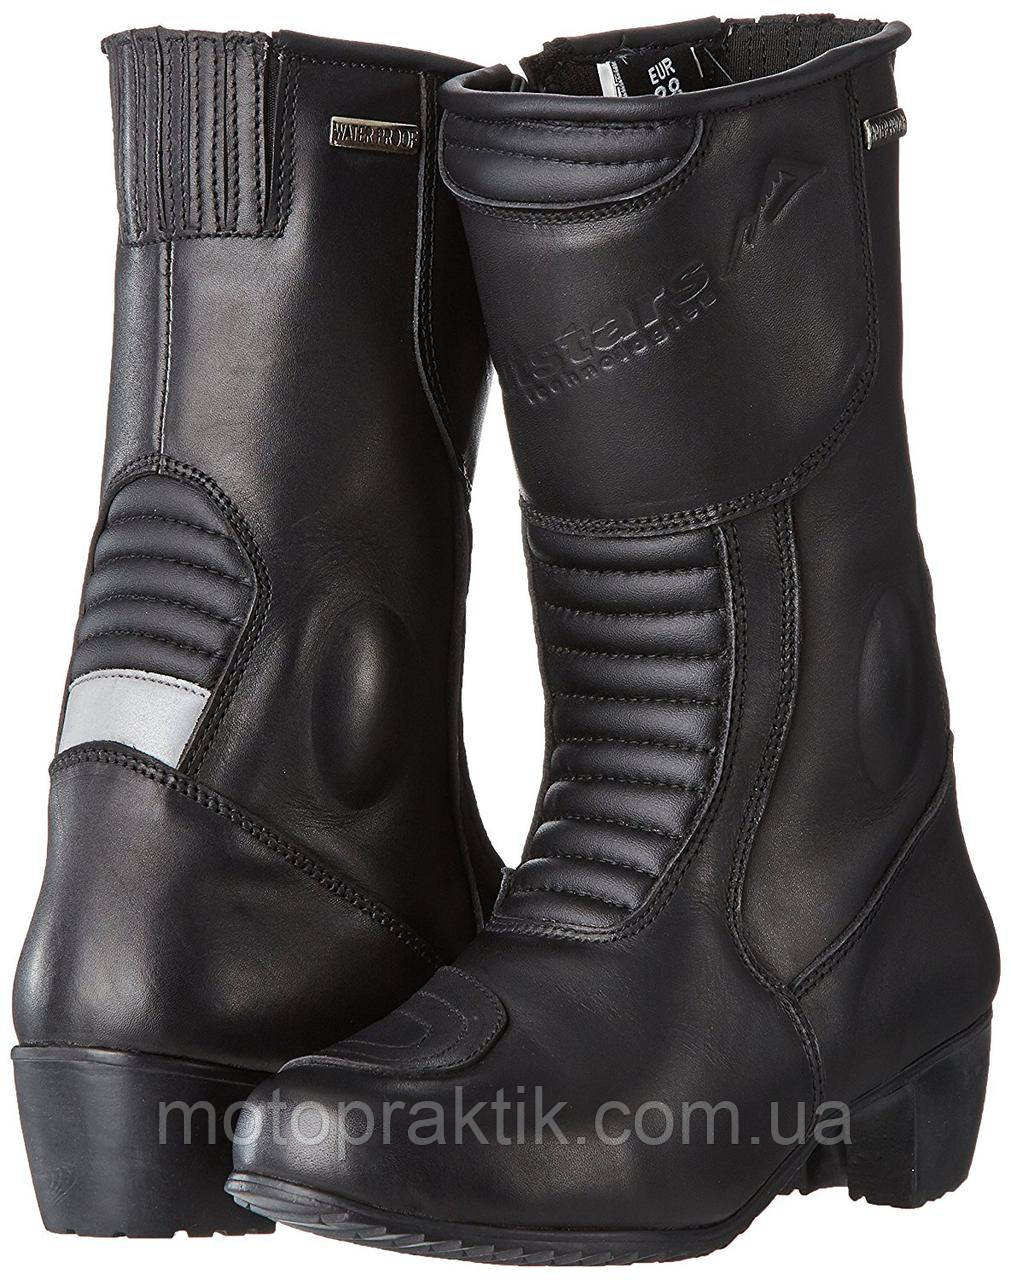 Outstars Siena Lady Boots, EU36 Мотоботы женские (кожа) с защитой